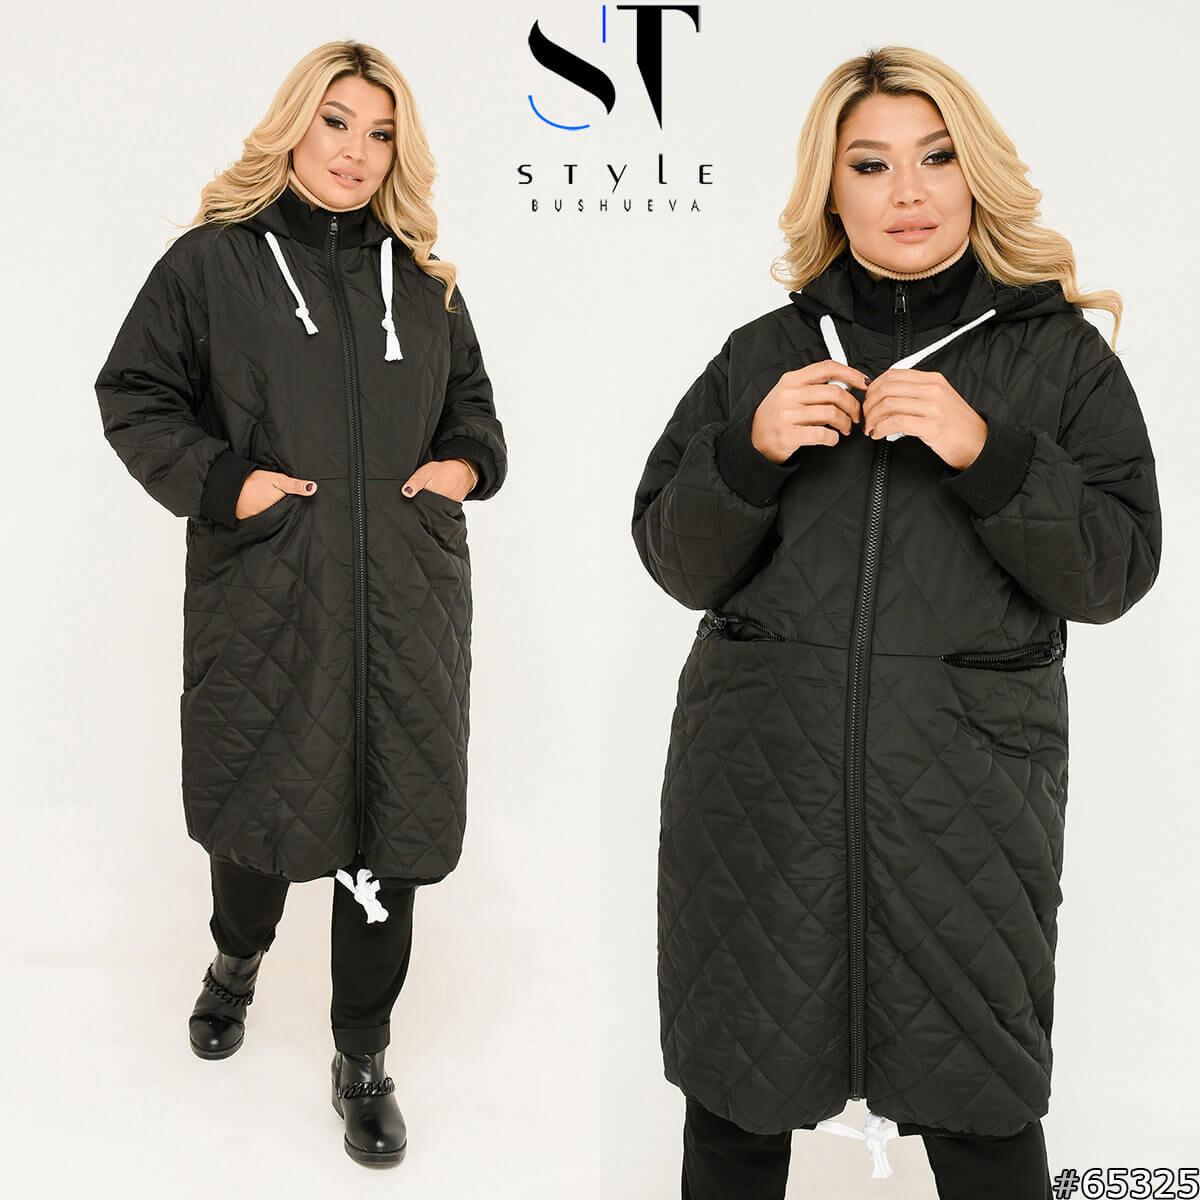 Подовжена стильна демісезонна куртка, синтепон 150, з утяжкой на подолі з 50 по 64 розмір